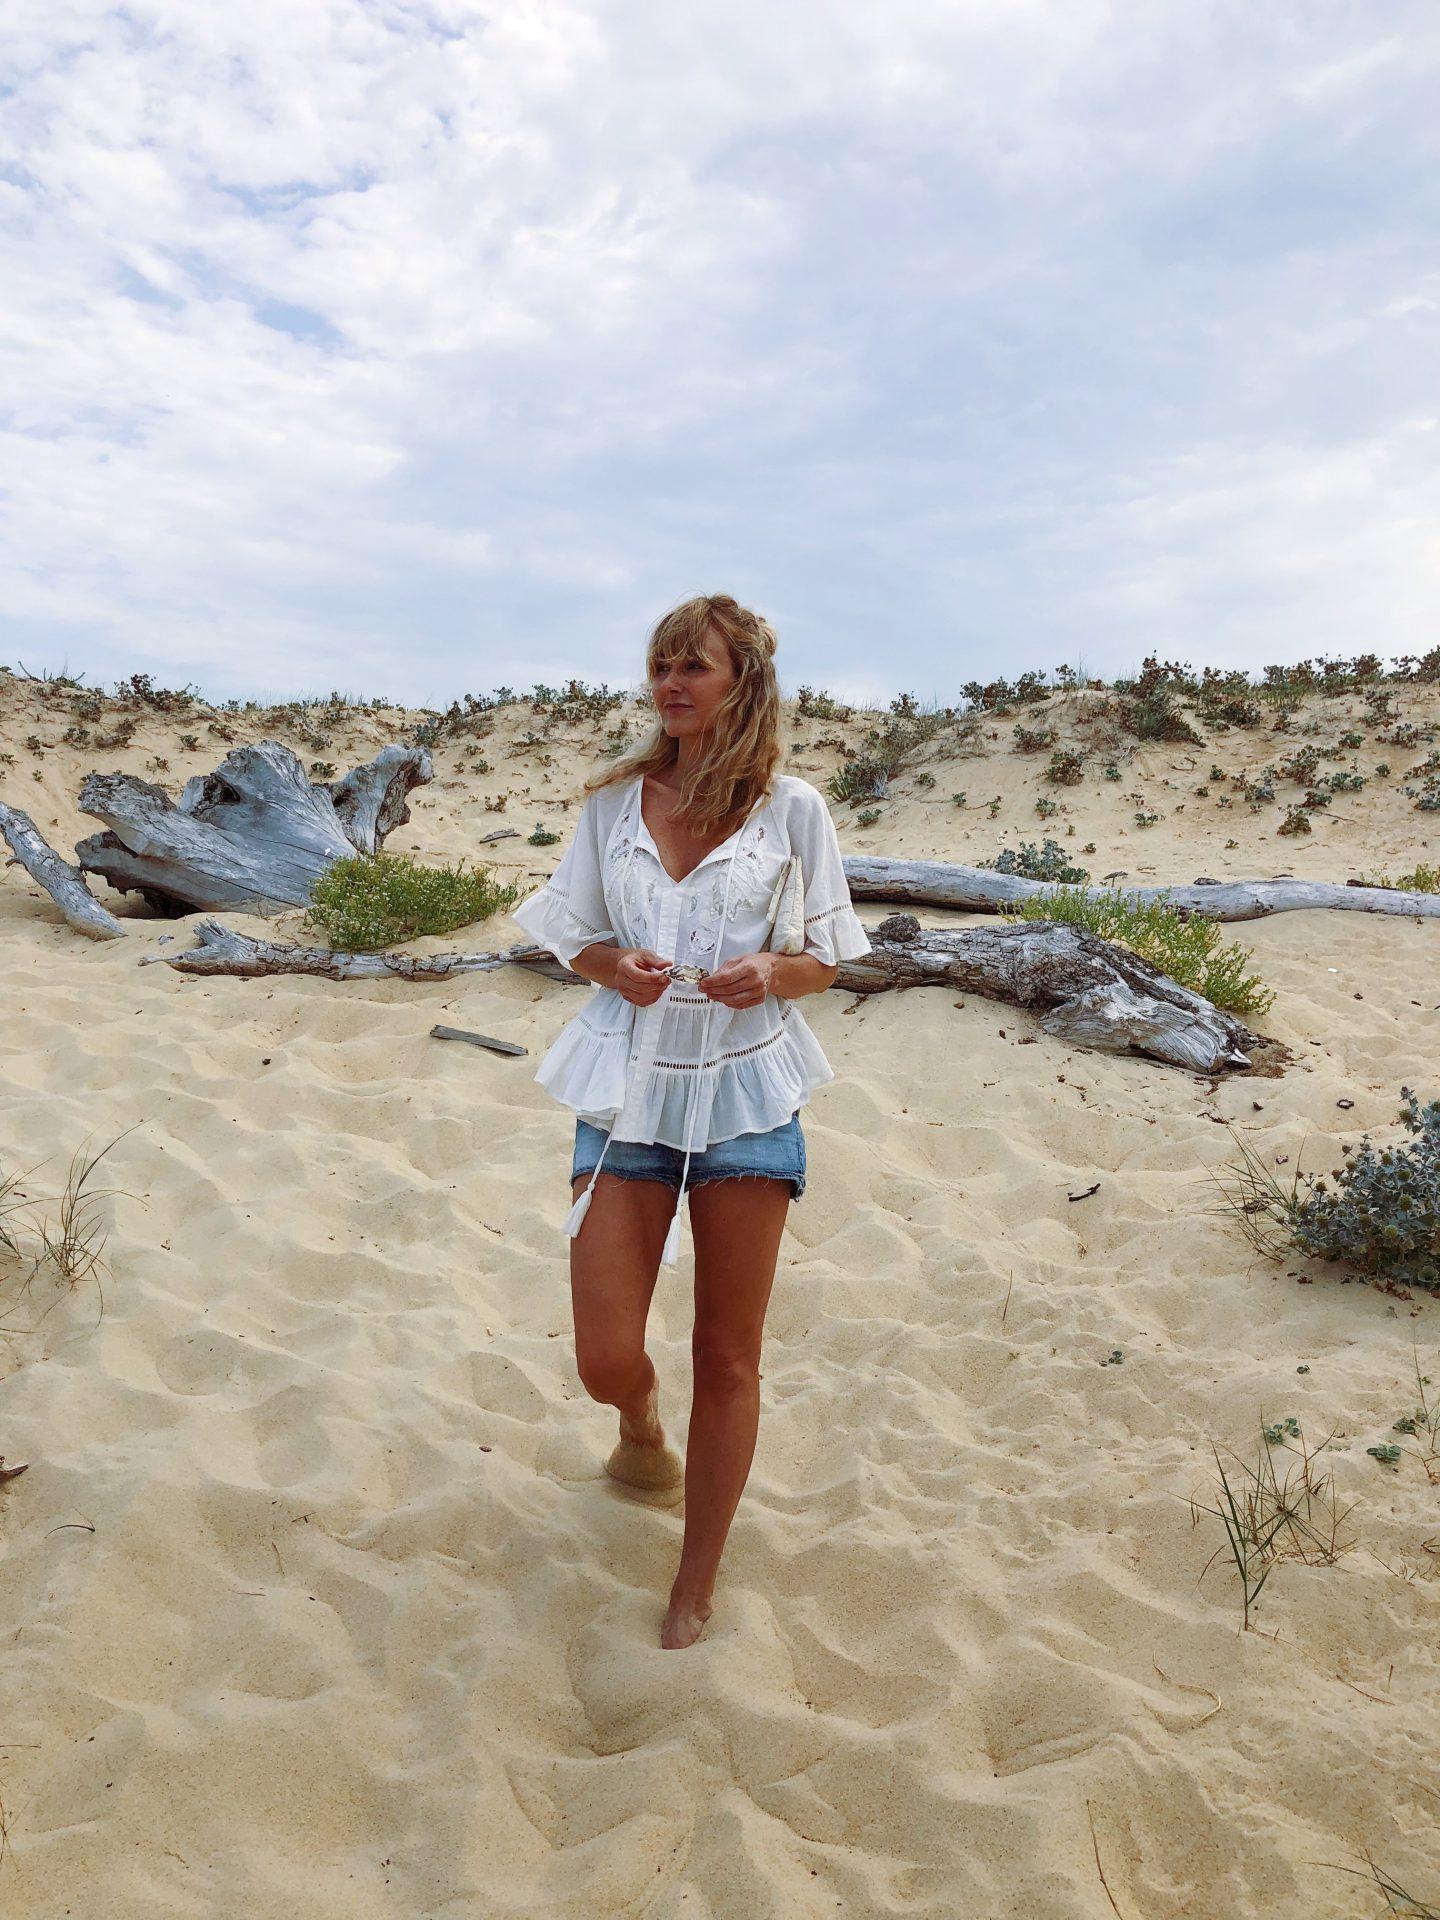 Einfache Meditation, Anleitung, Sarah Blondin, Breathing App, Nowshine ü40 Lifestyle Blog